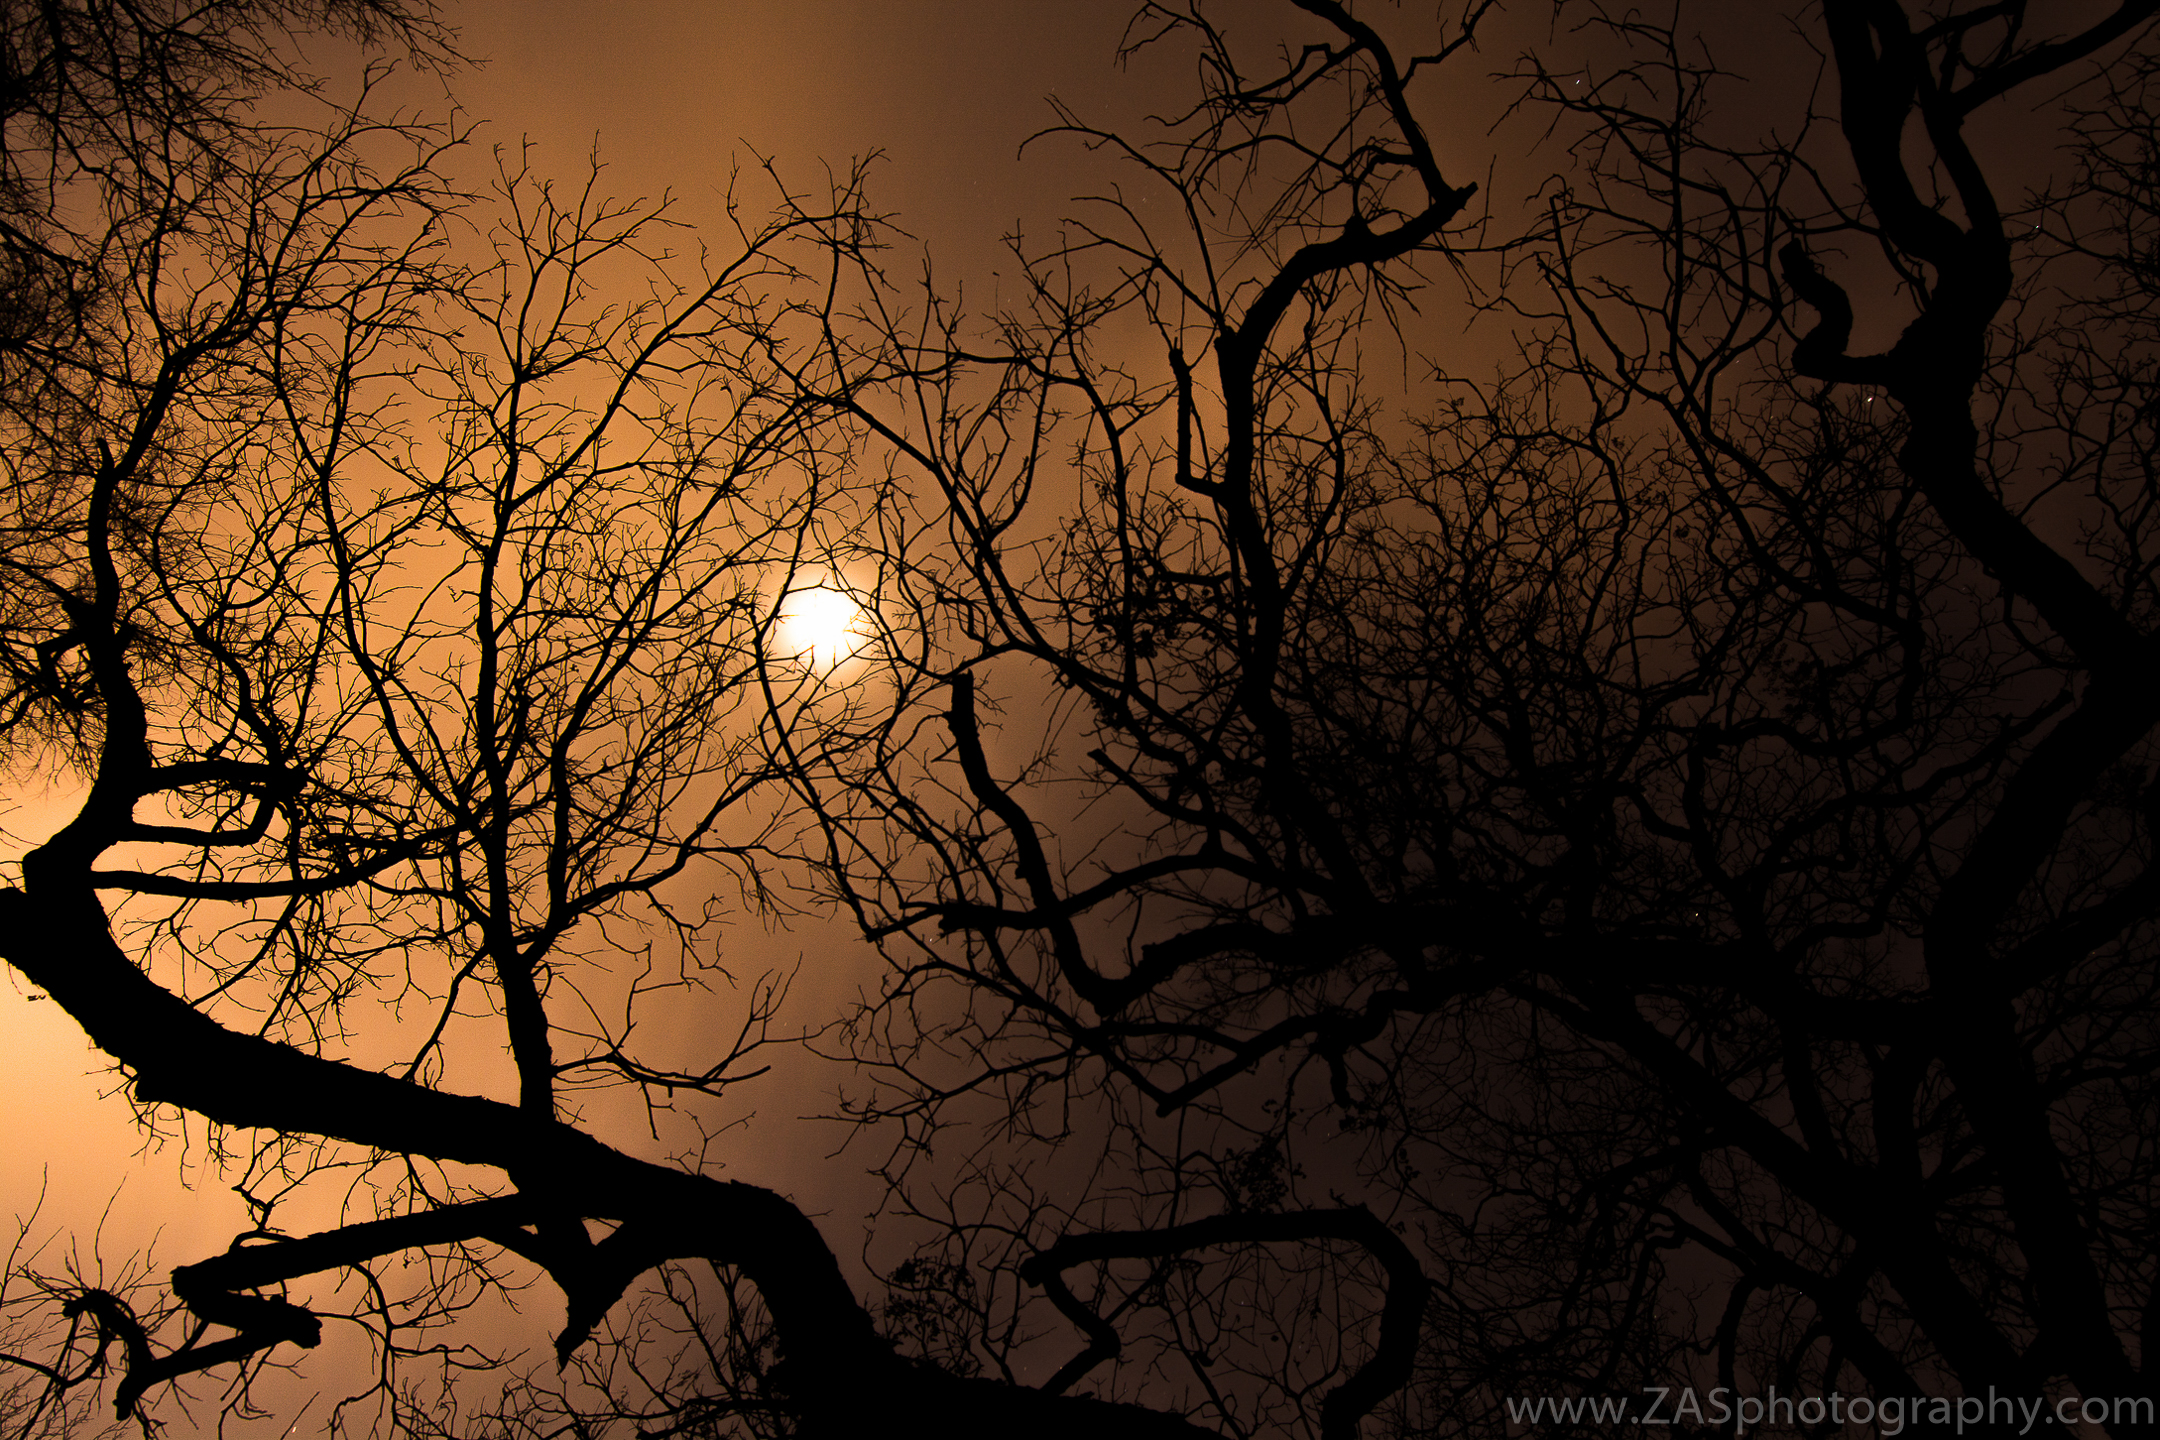 Bob Woodruff Park, Plano, TX. February sunset.